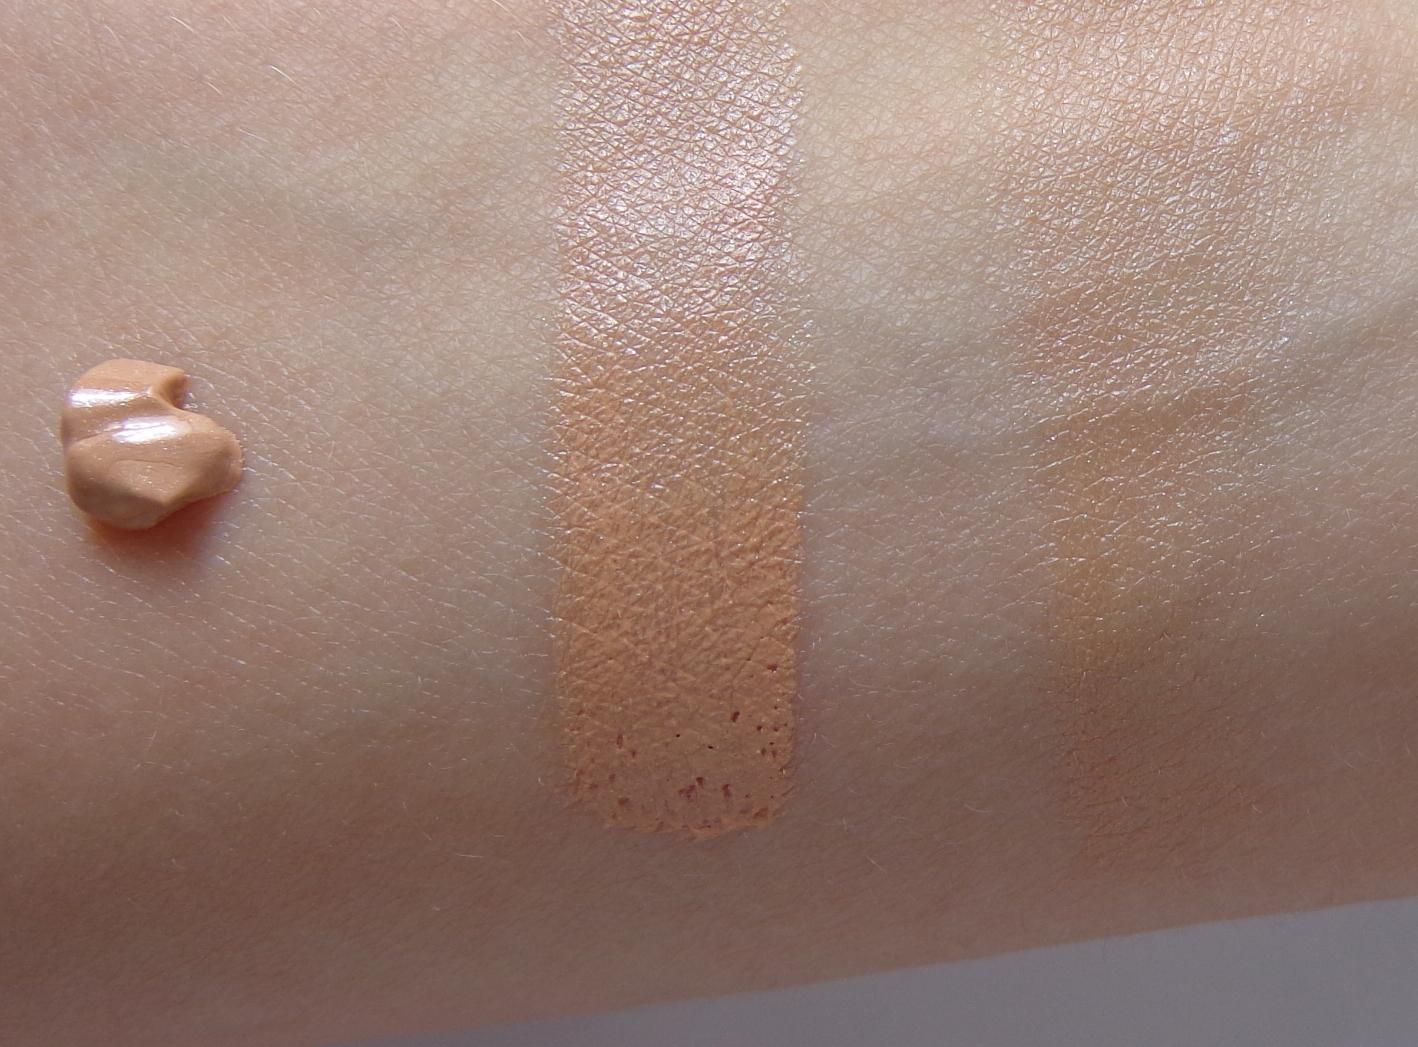 Protect + Tint Tinted Moisturizer by Neutrogena #6